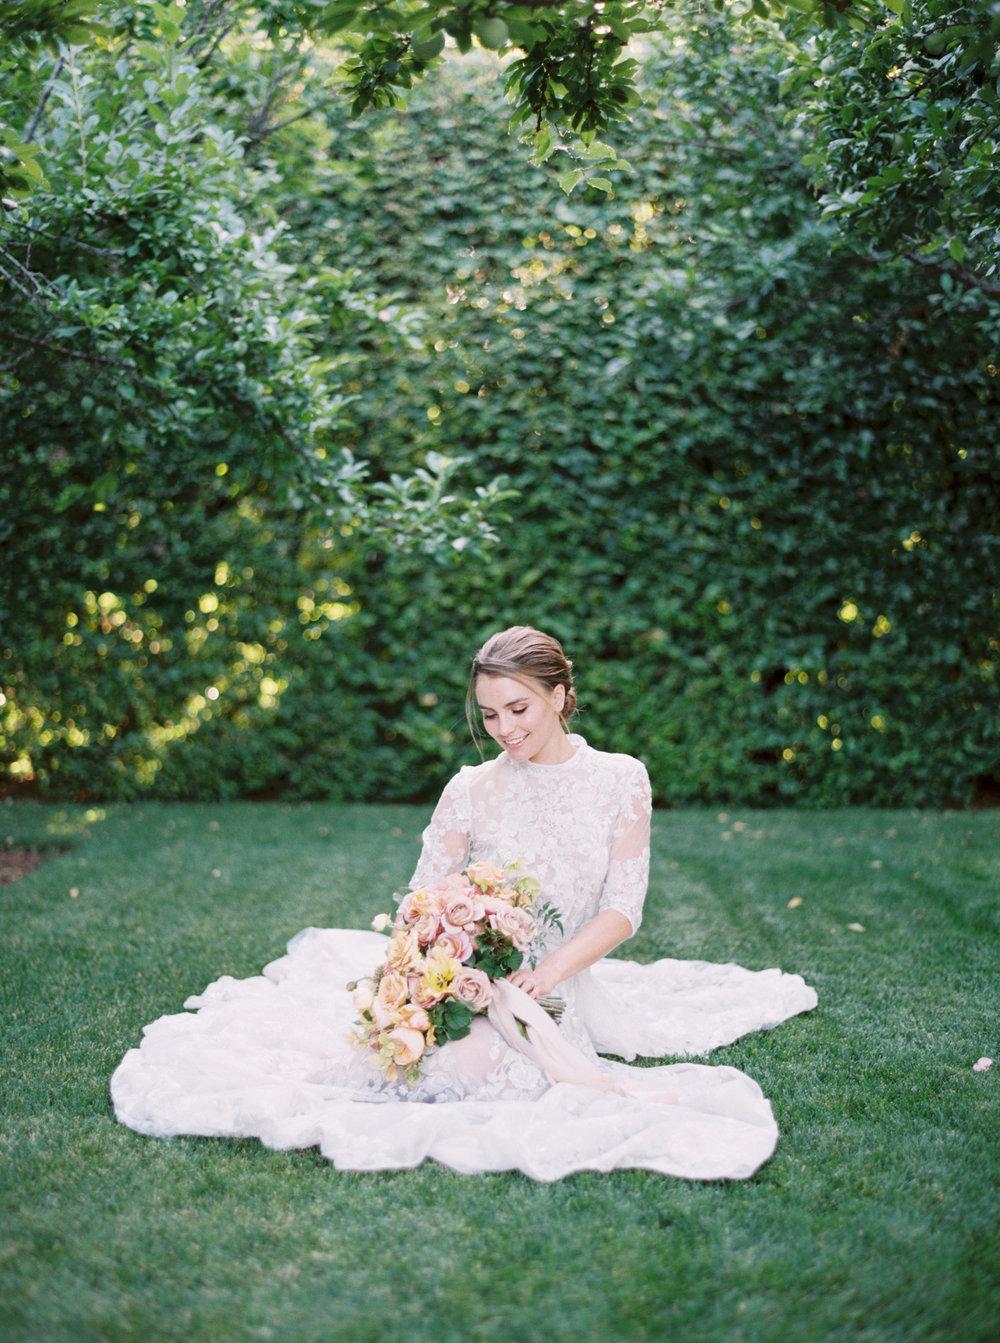 JennyQuicksallPhotography_www.jennyquicksall.com_KestlerPark_SantaYnezCalifornia_JoyProctor(128).jpg